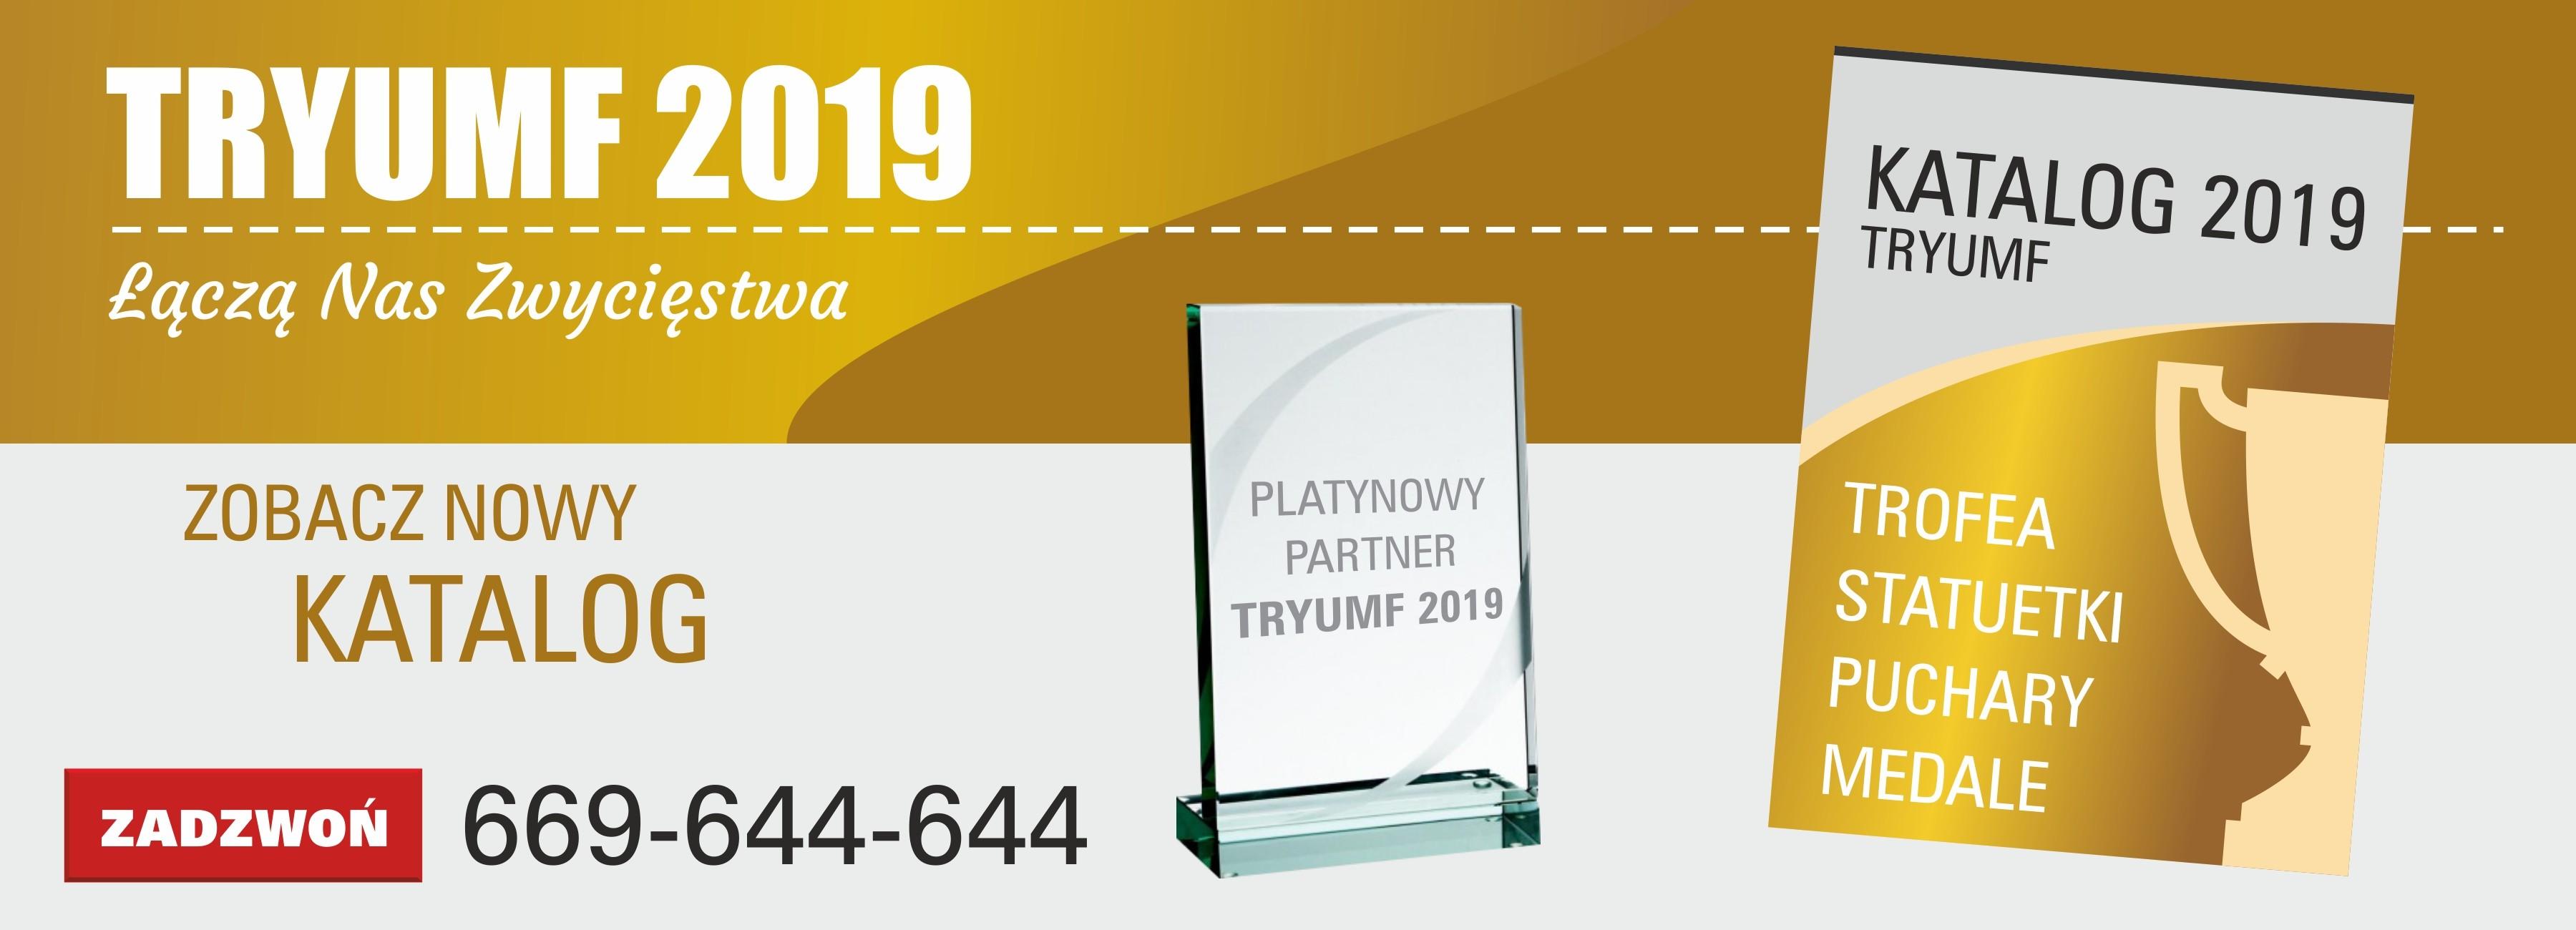 https://pucharowo.pl/katalog-trofea-sportowe-tryumf